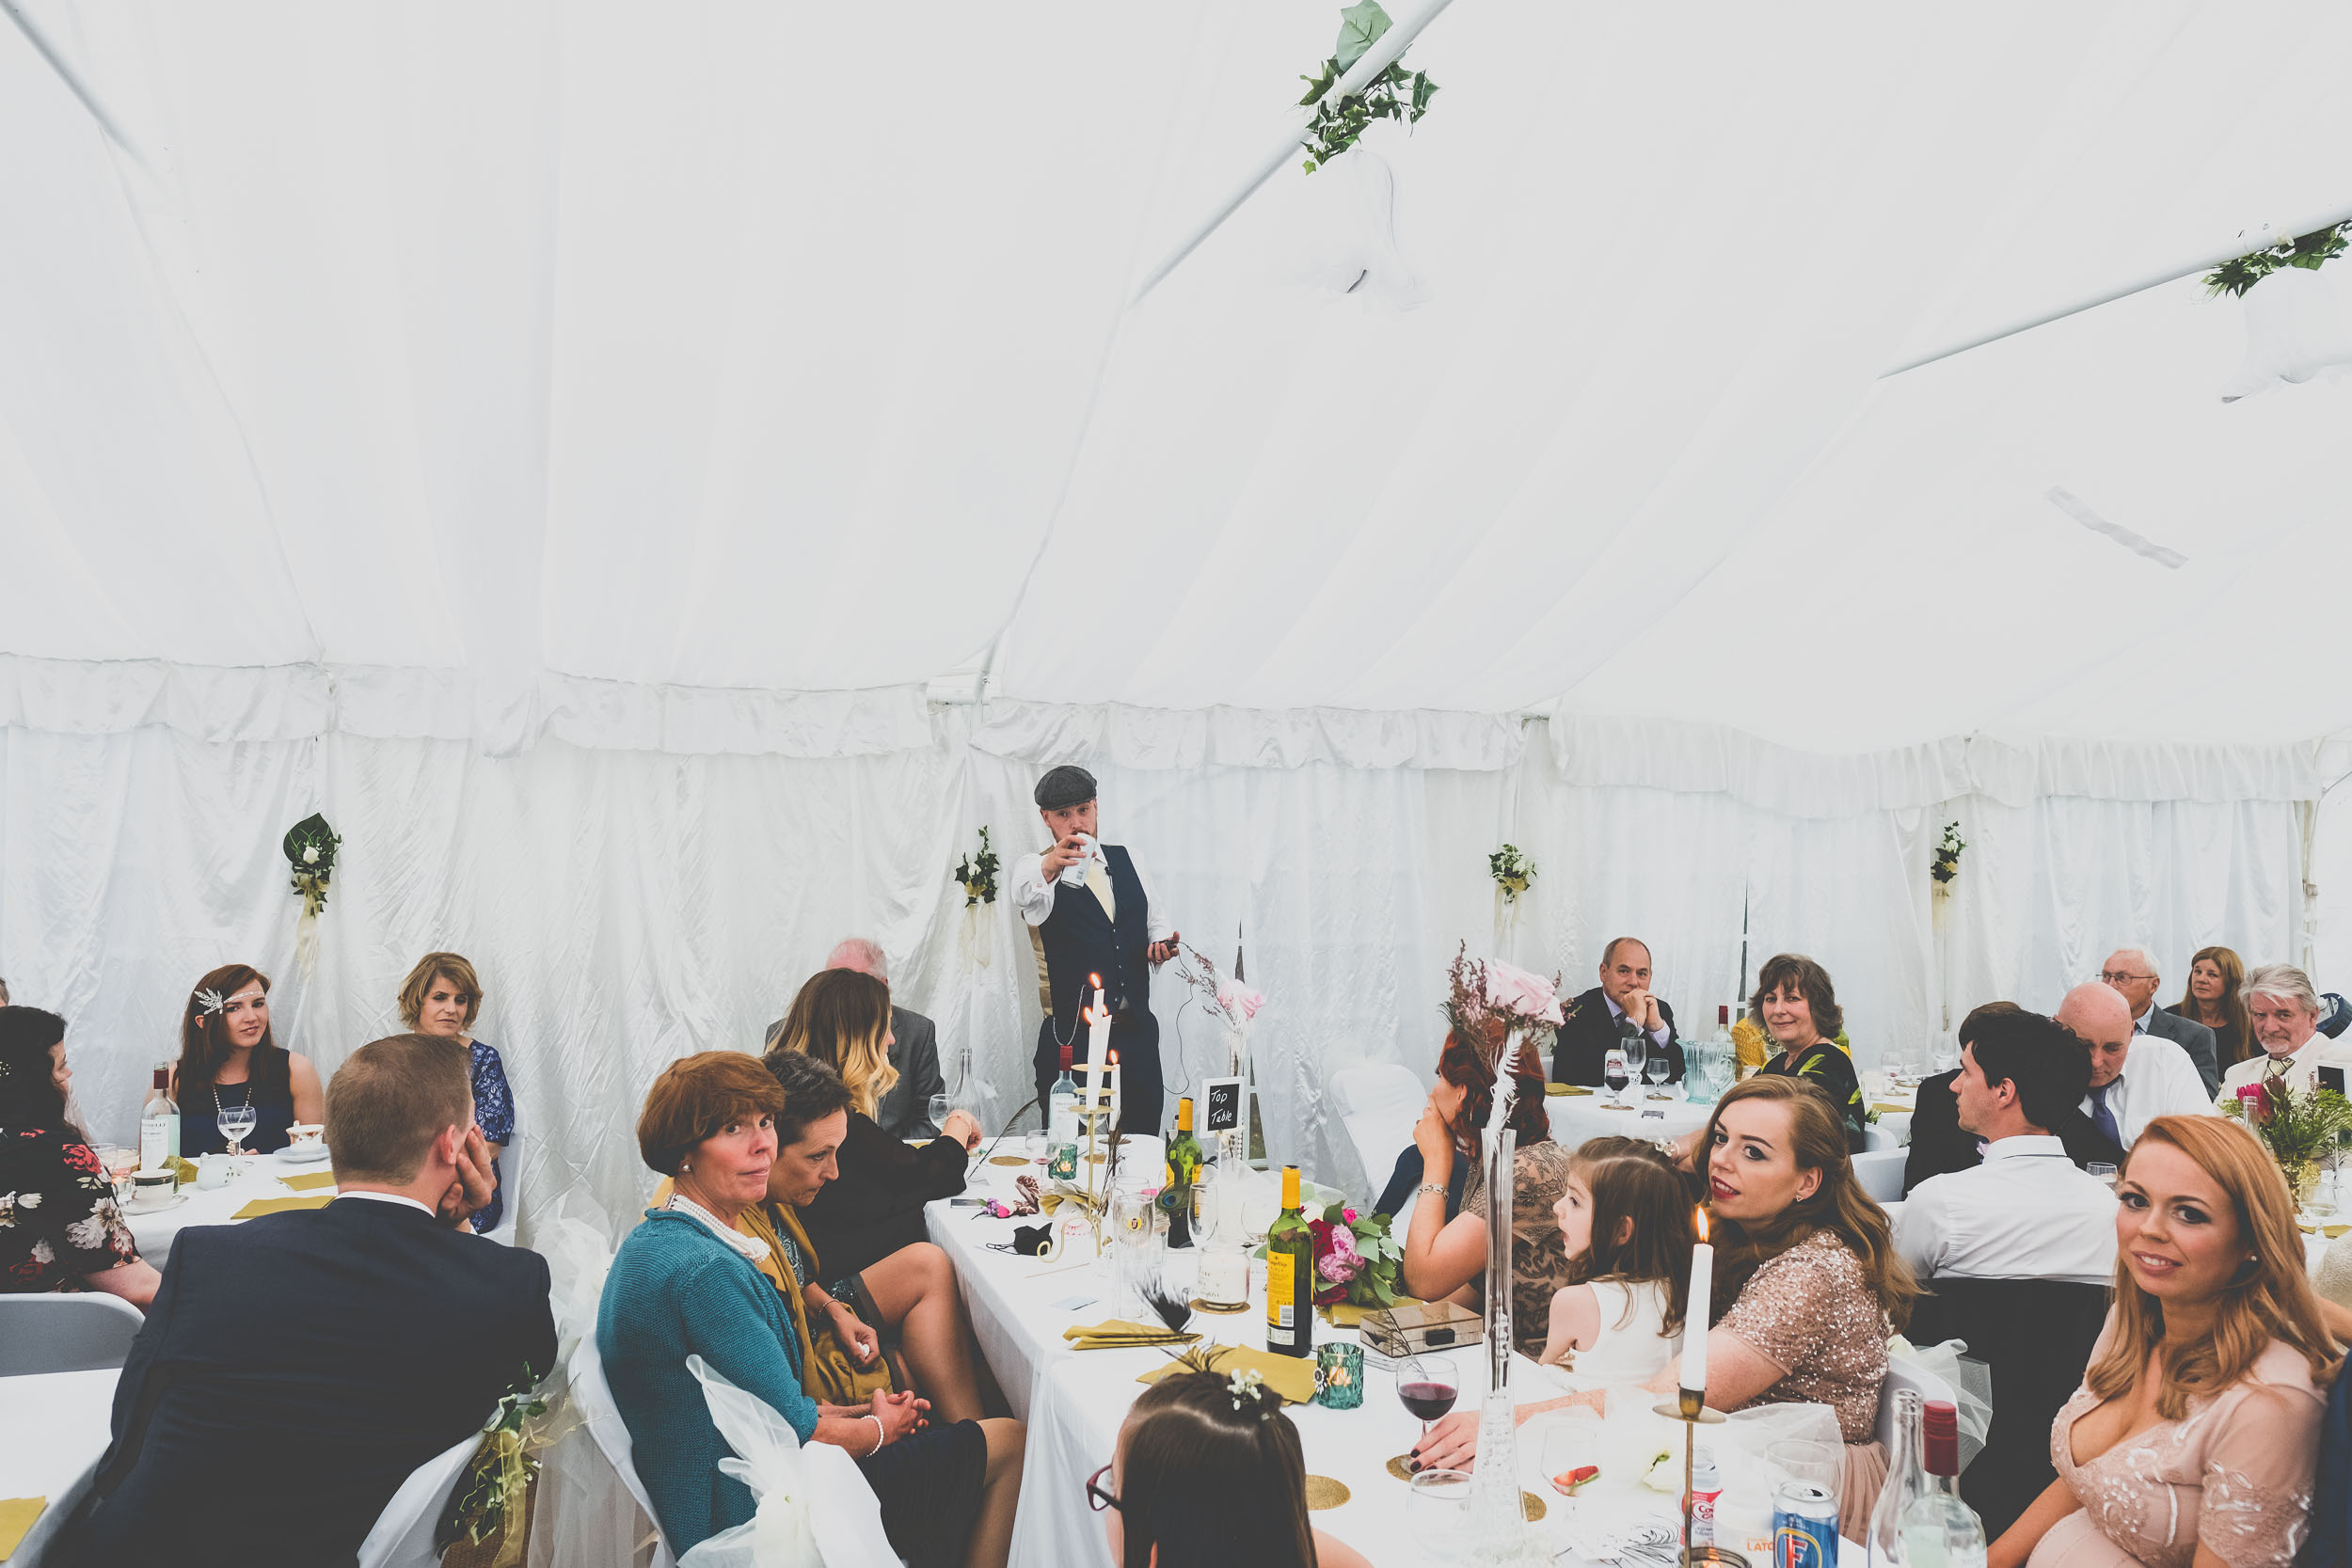 queen-elizabeths-hunting-lodge-epping-forest-wedding347.jpg